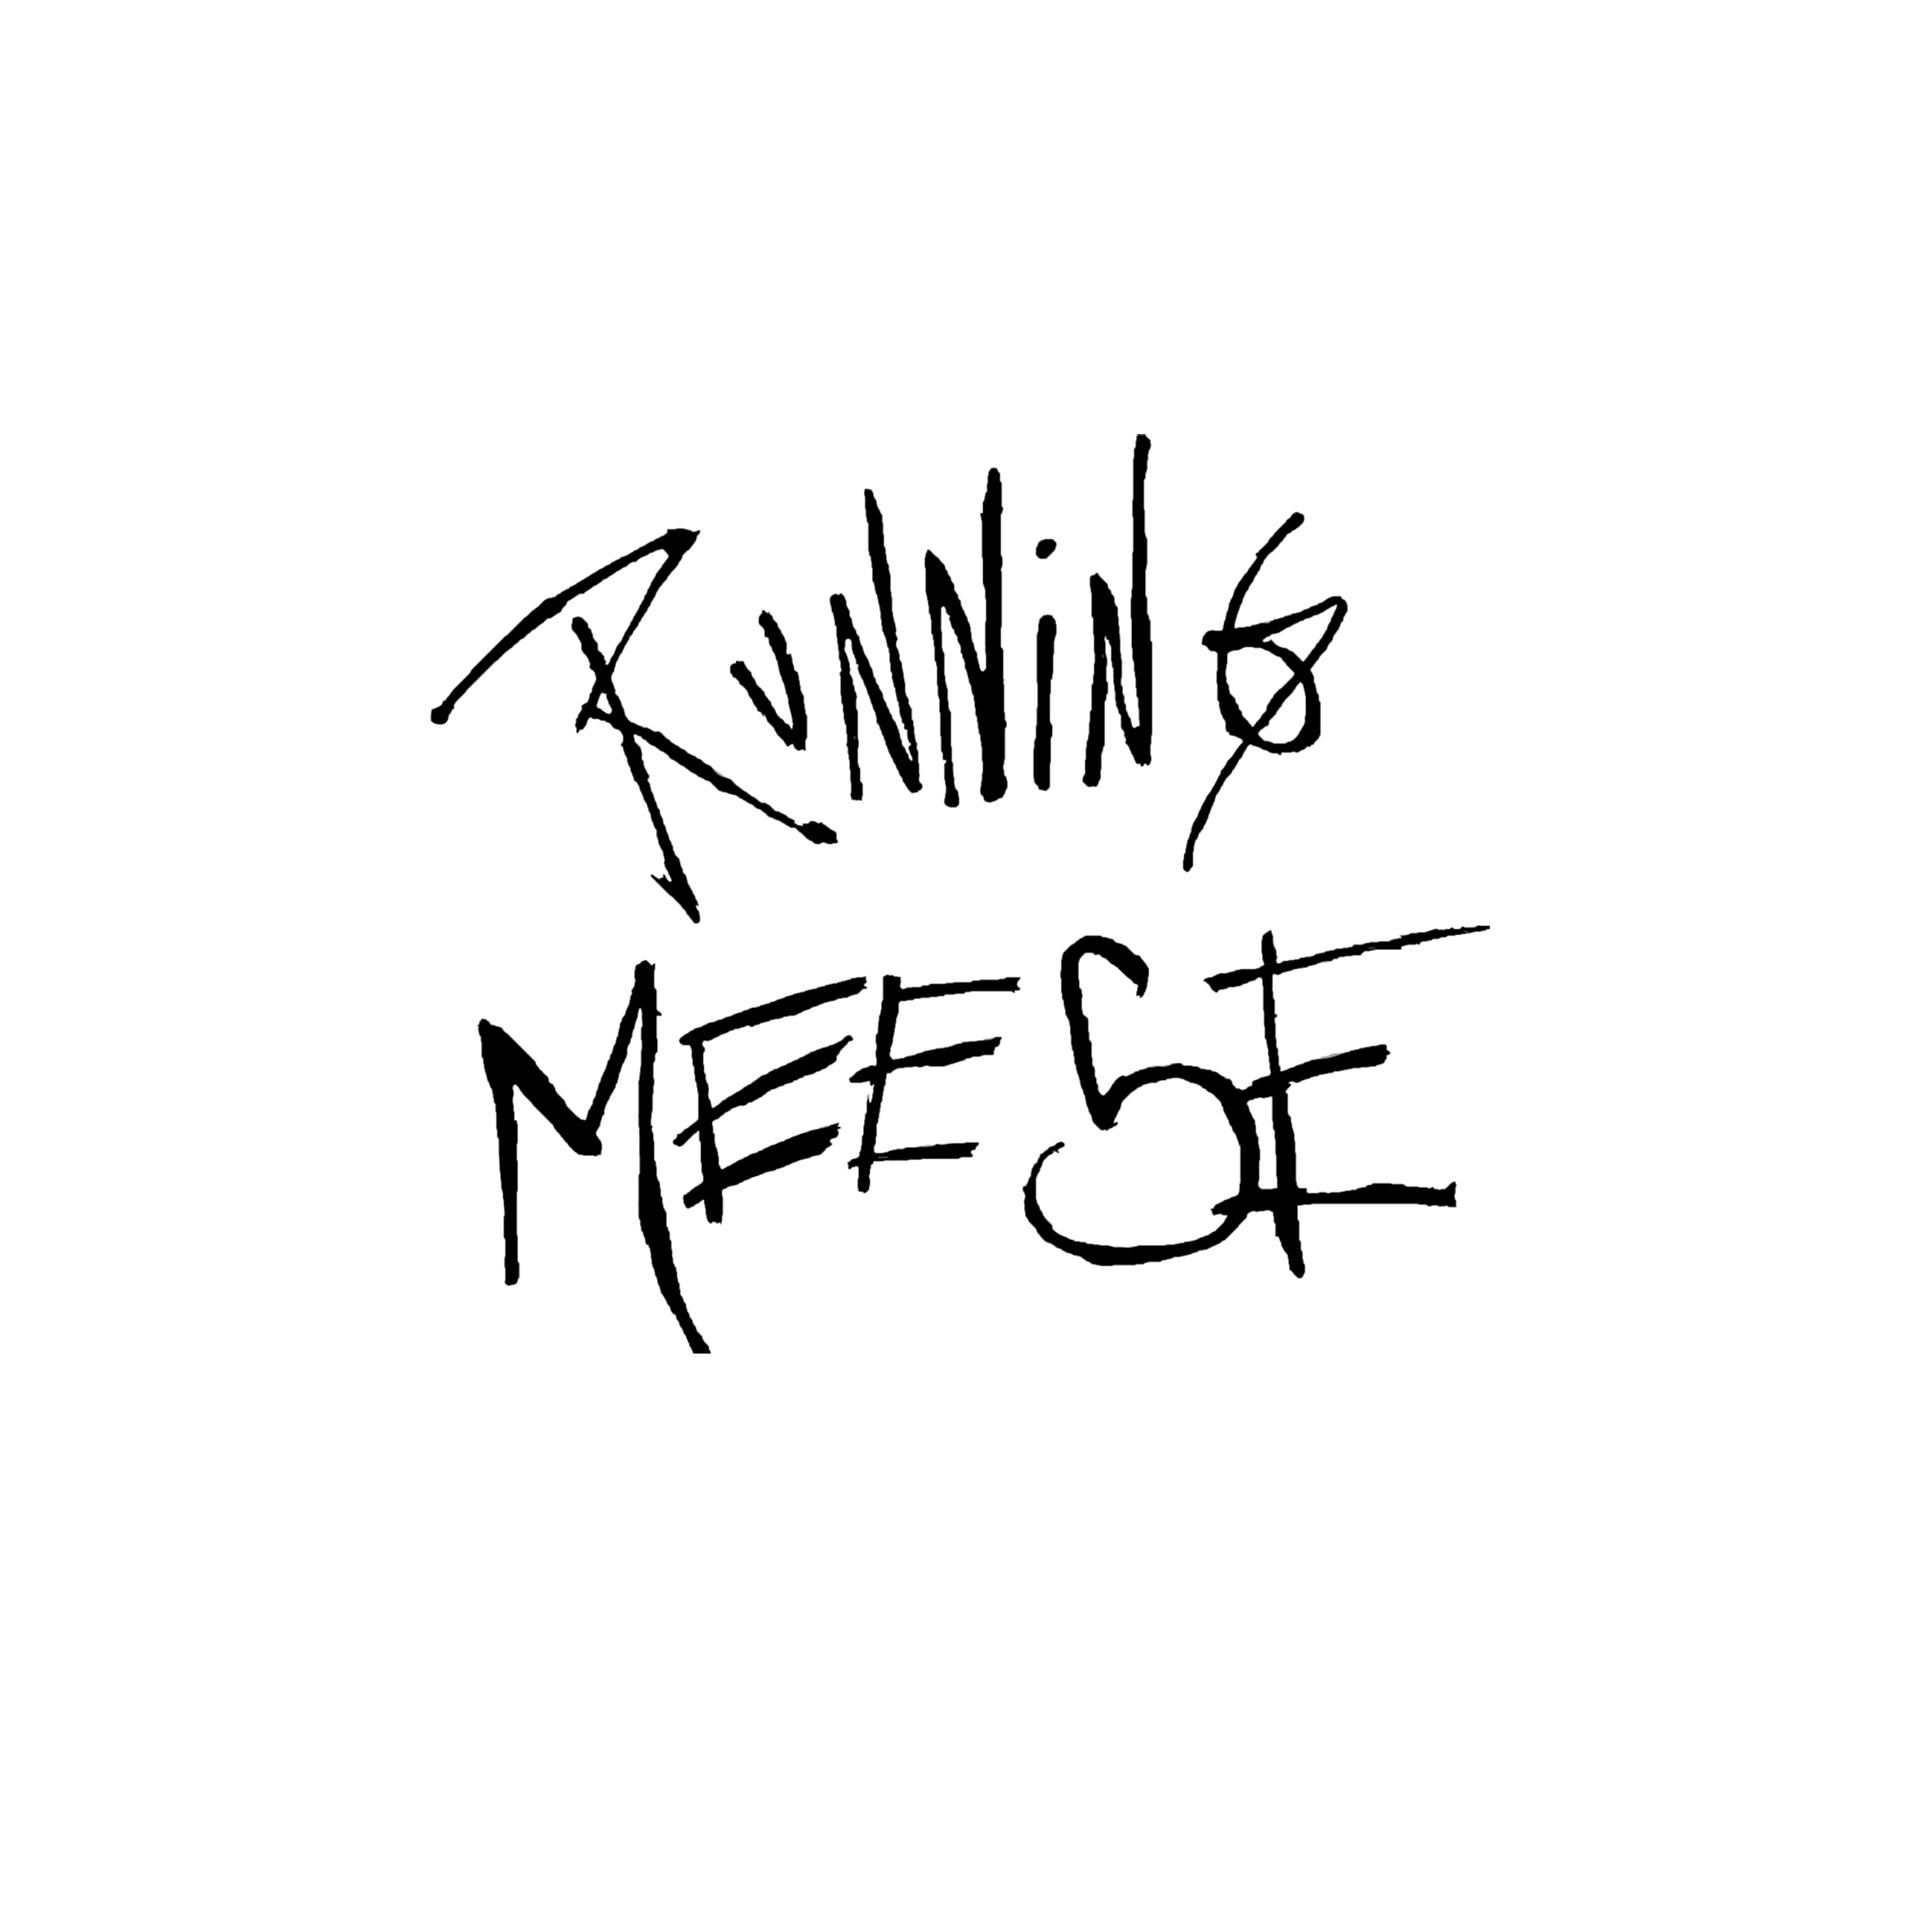 Running Meese